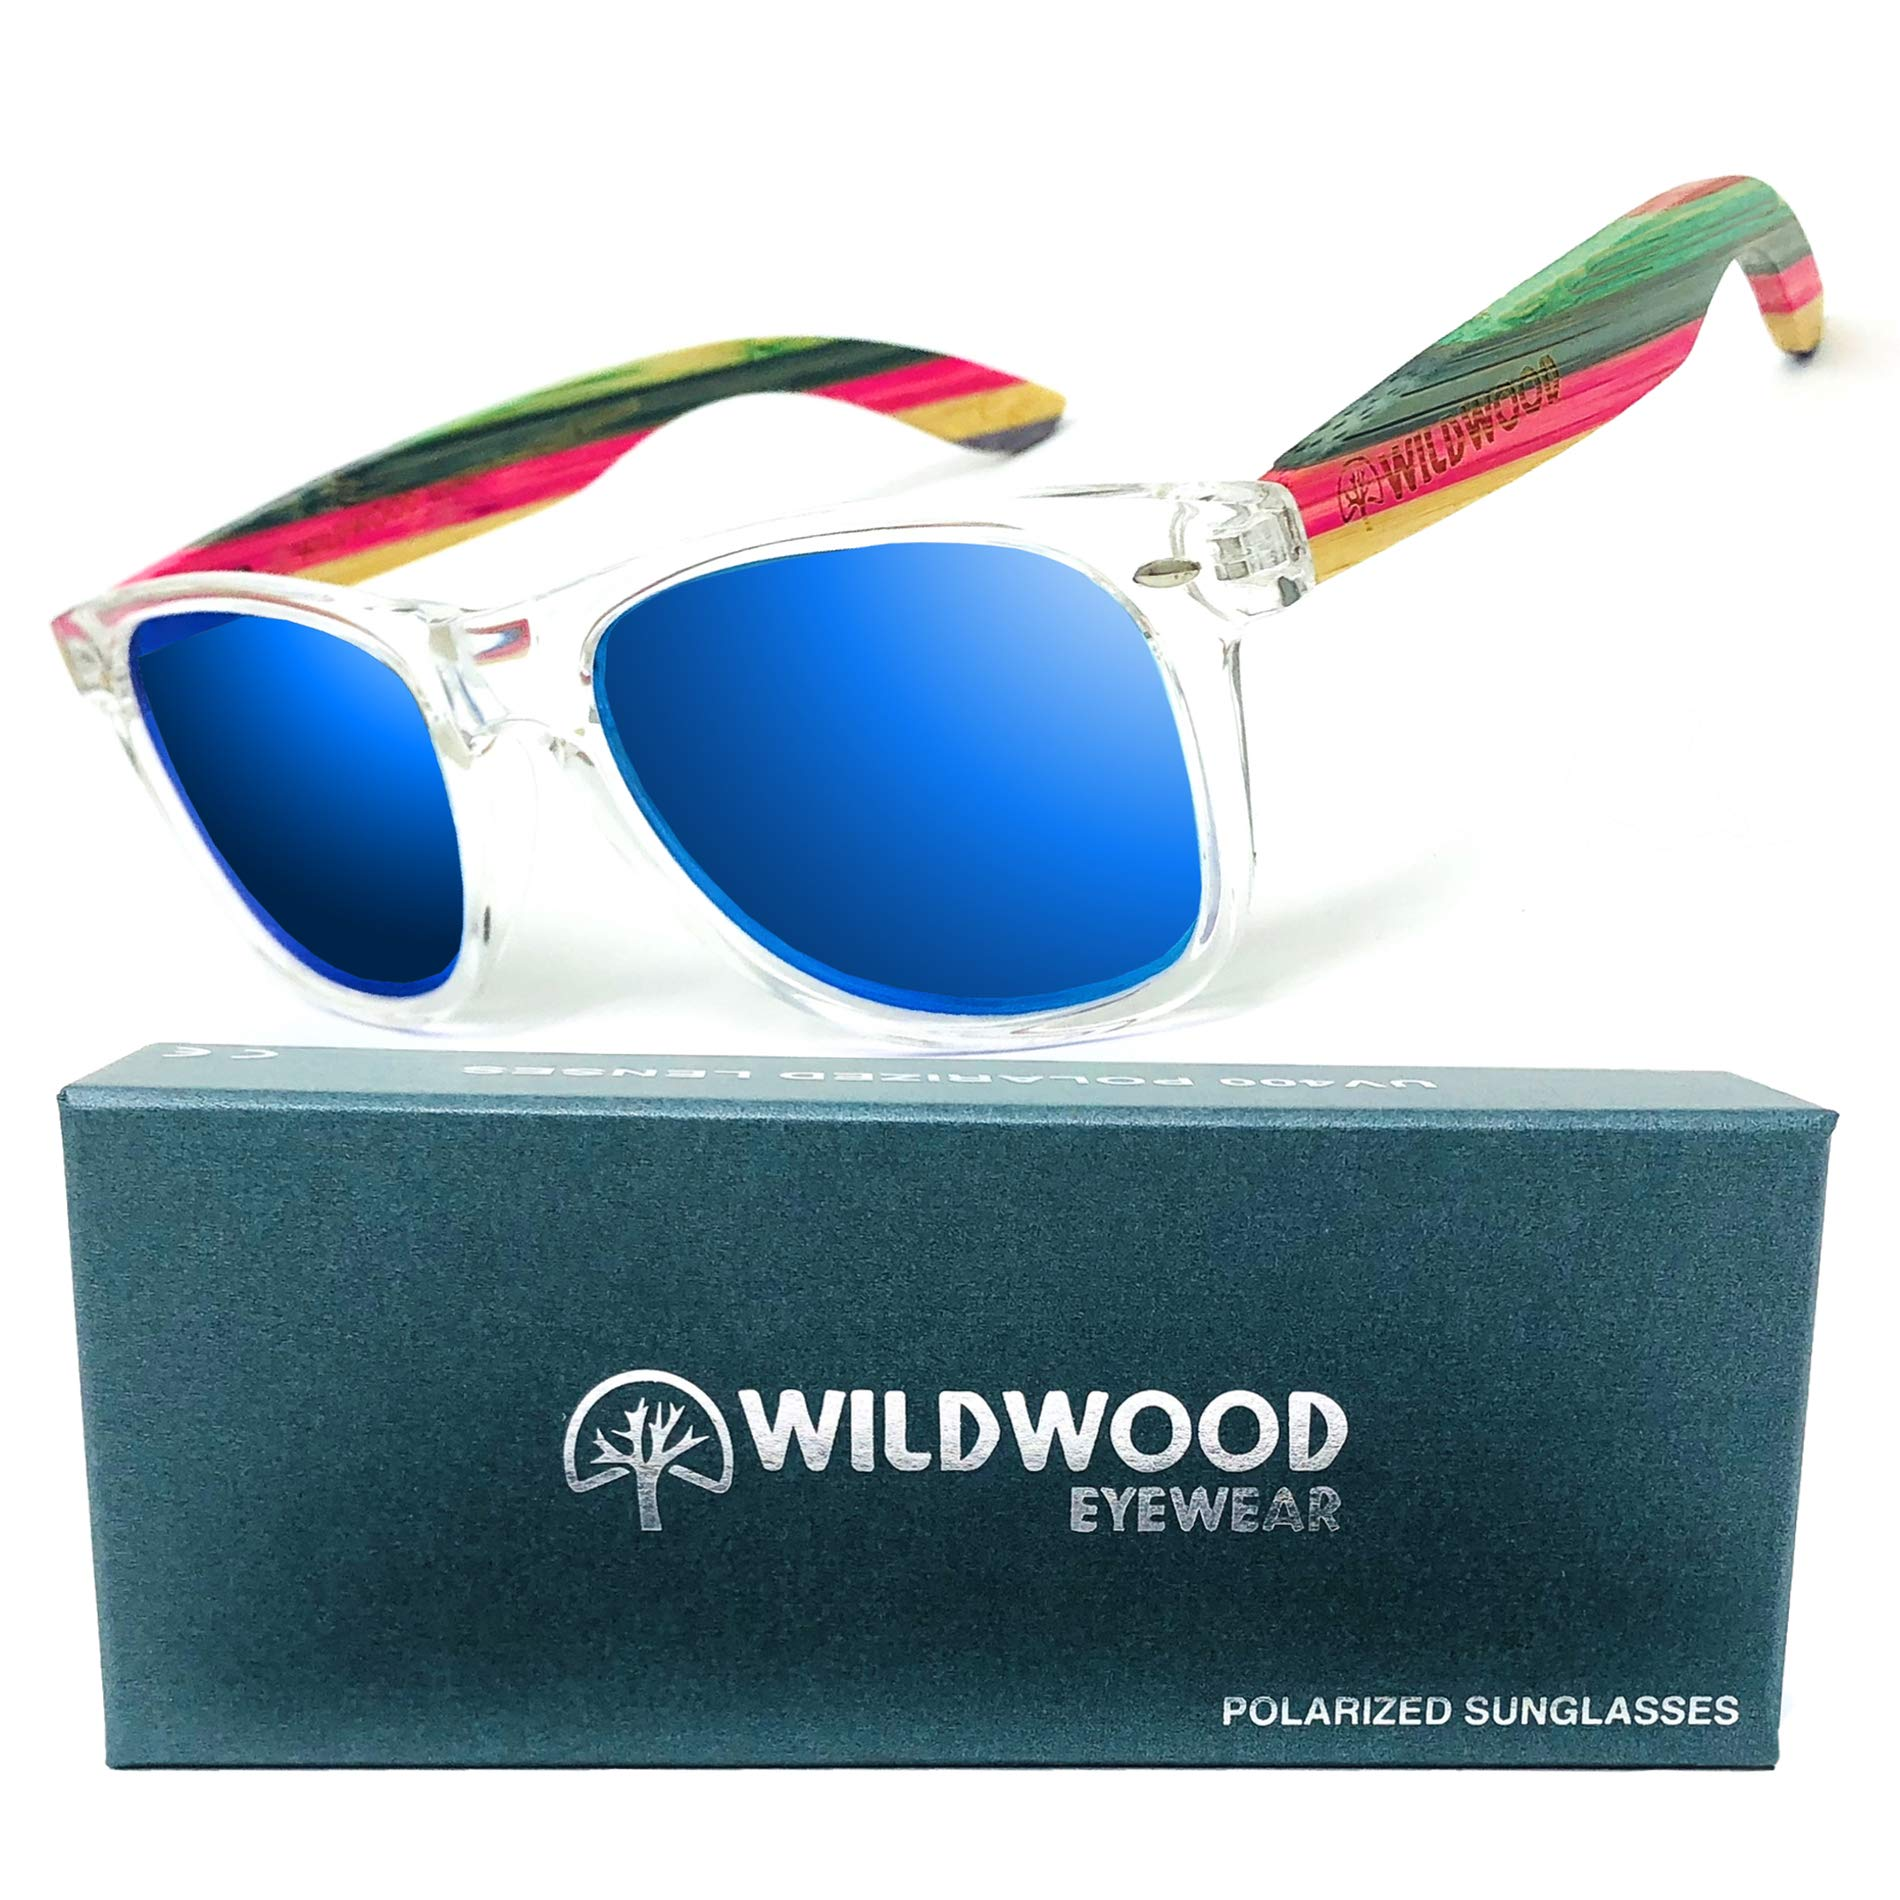 Wildwood Summer Bamboo Clear Wayfarer Polarized Sunglasses for Women (Blue Mirror)